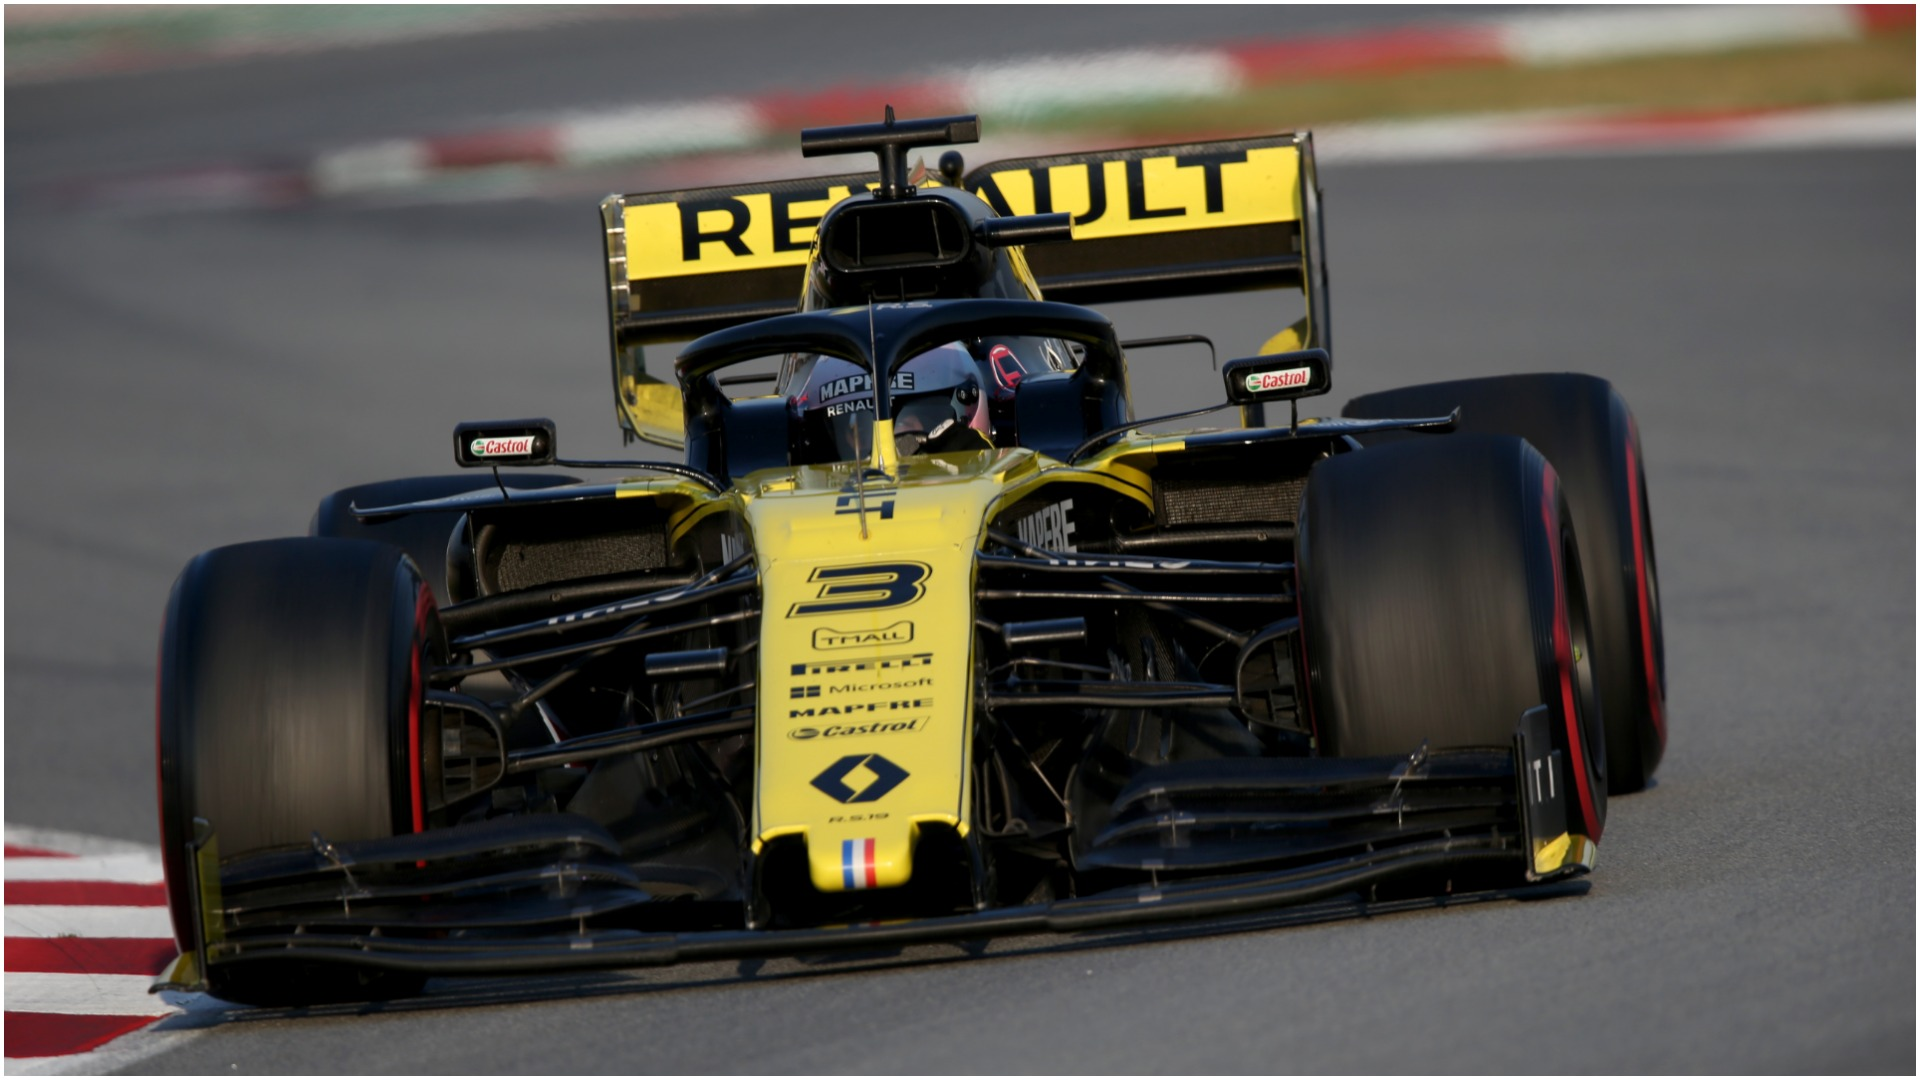 F1 Raceweek: Ricciardo rested and ready to respond